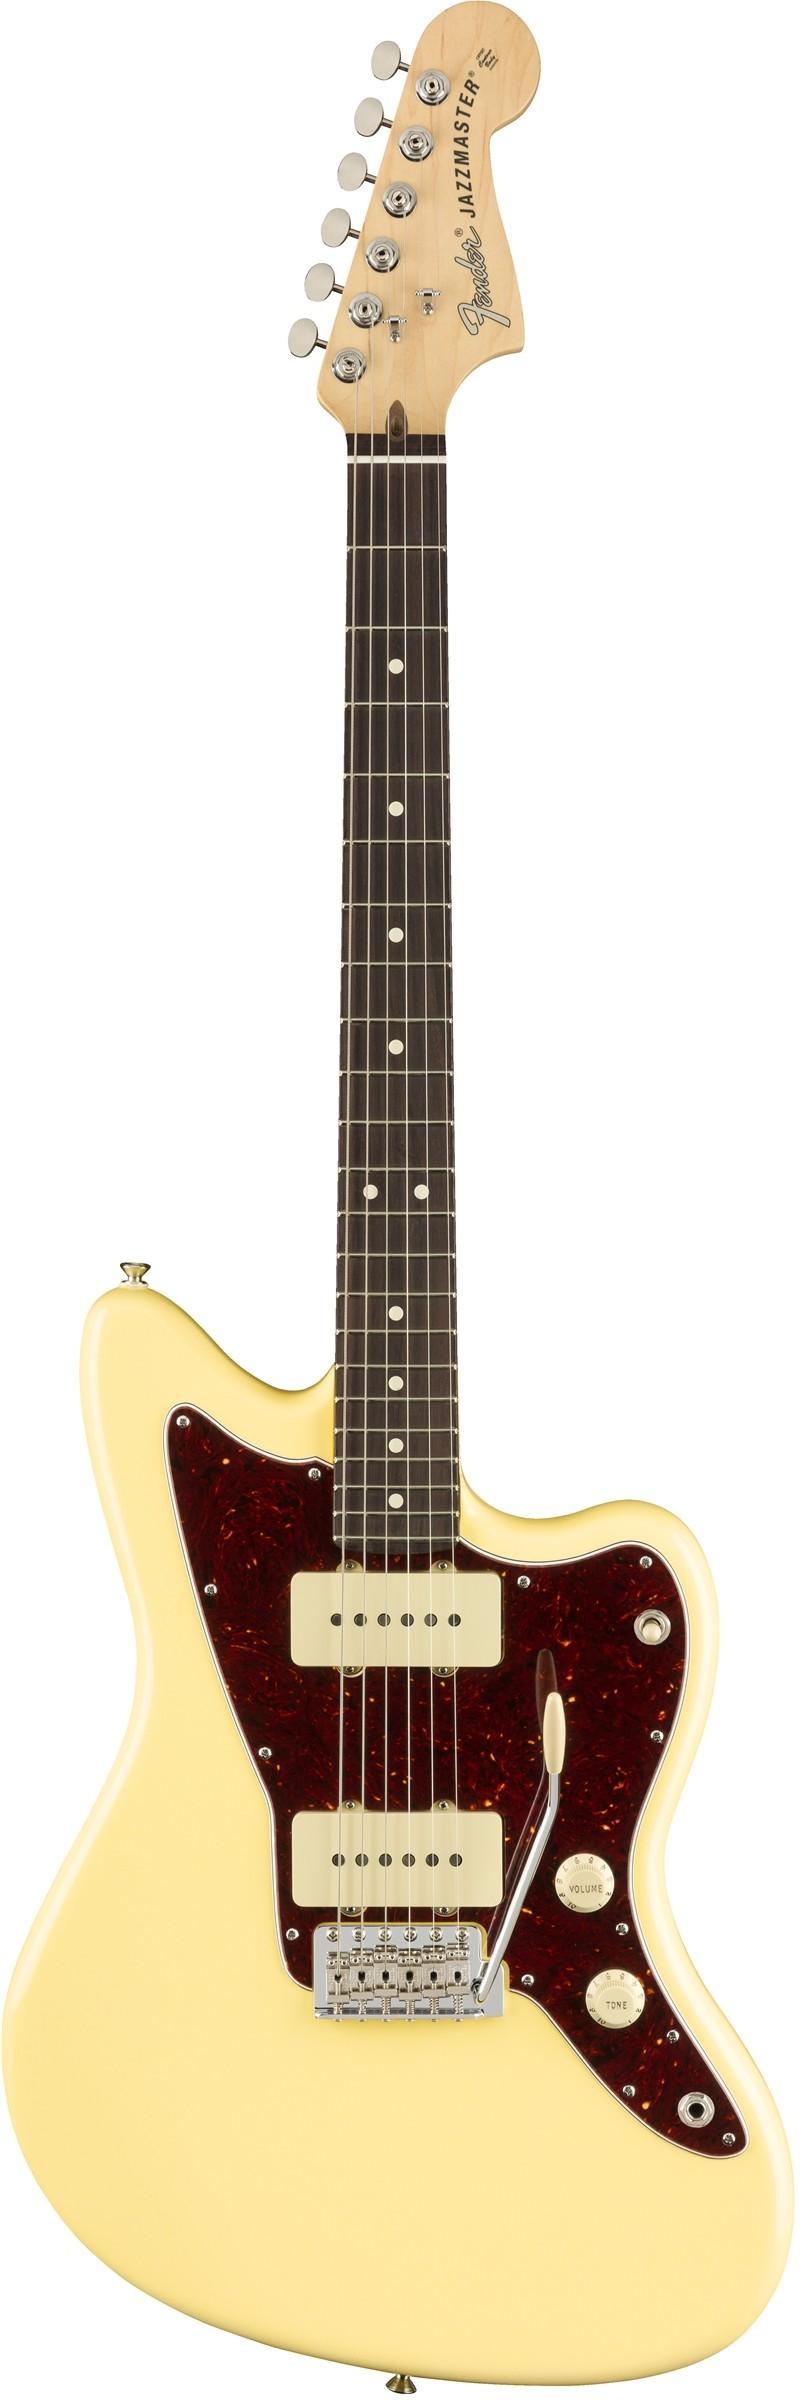 Электрогитара Fender American Performer Jazzmaster Rosewood Fingerboard Vintage White